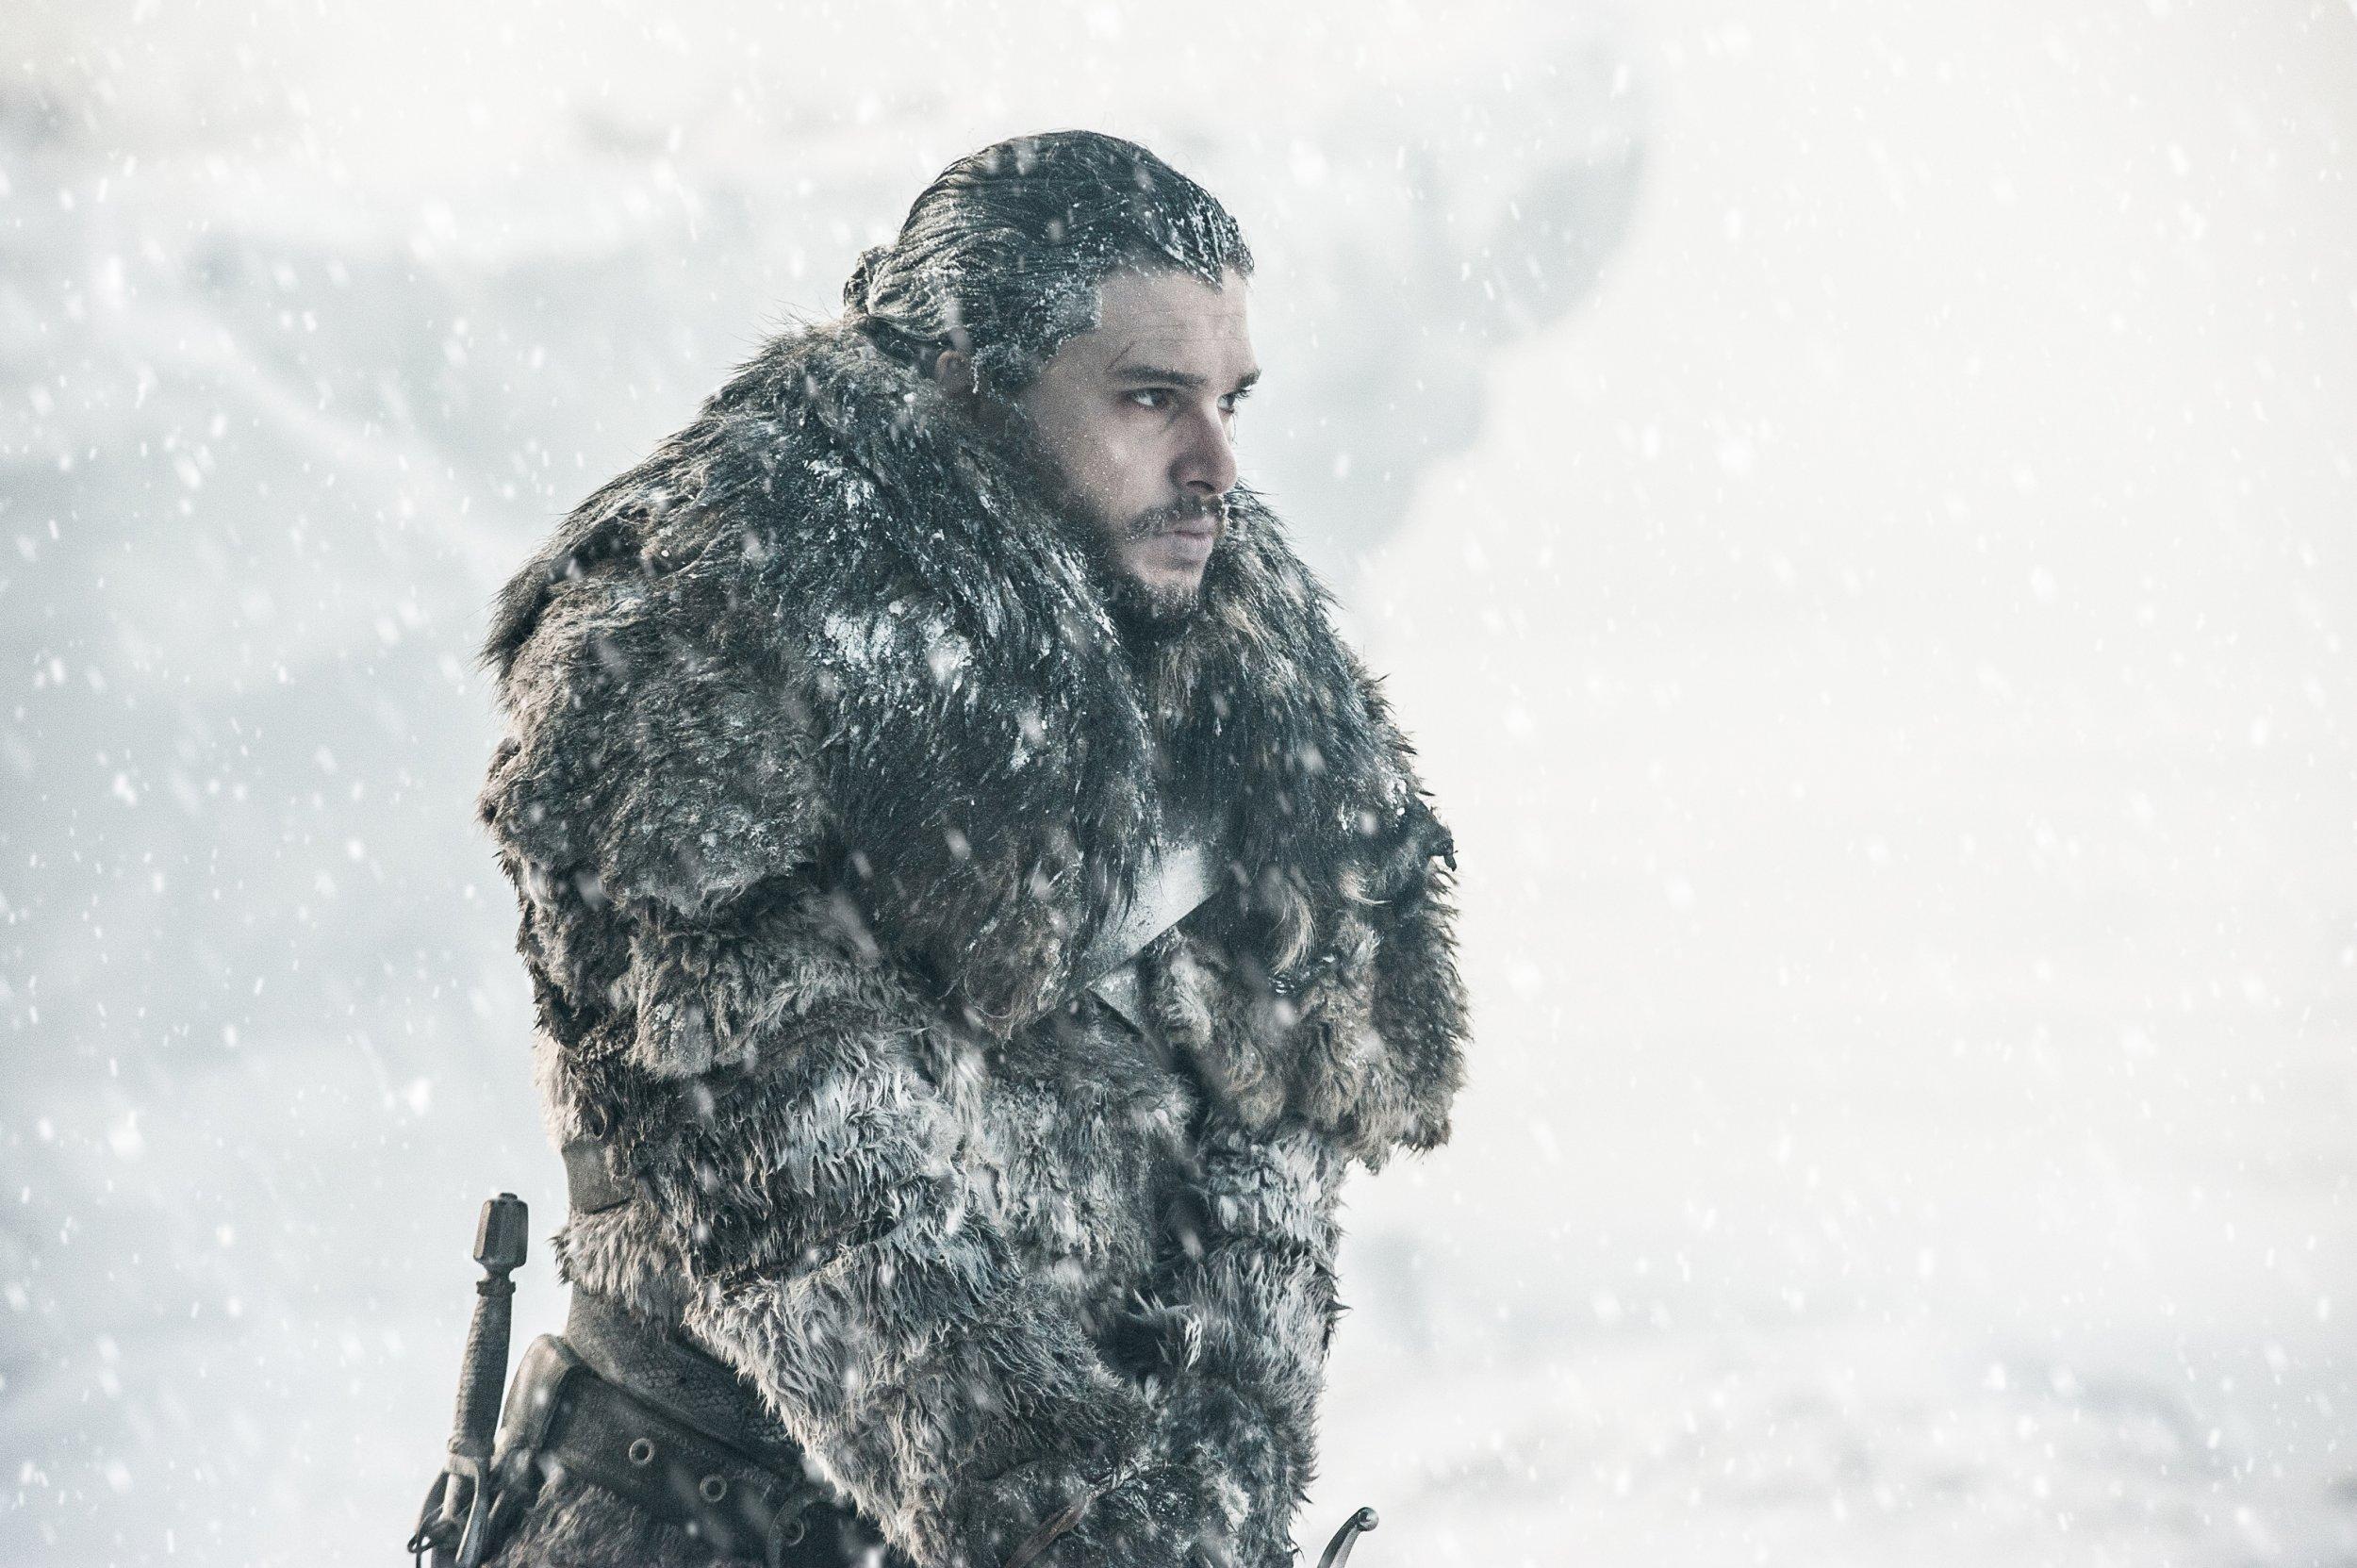 Game of Thrones - Beyond the Wall - Jon Snow